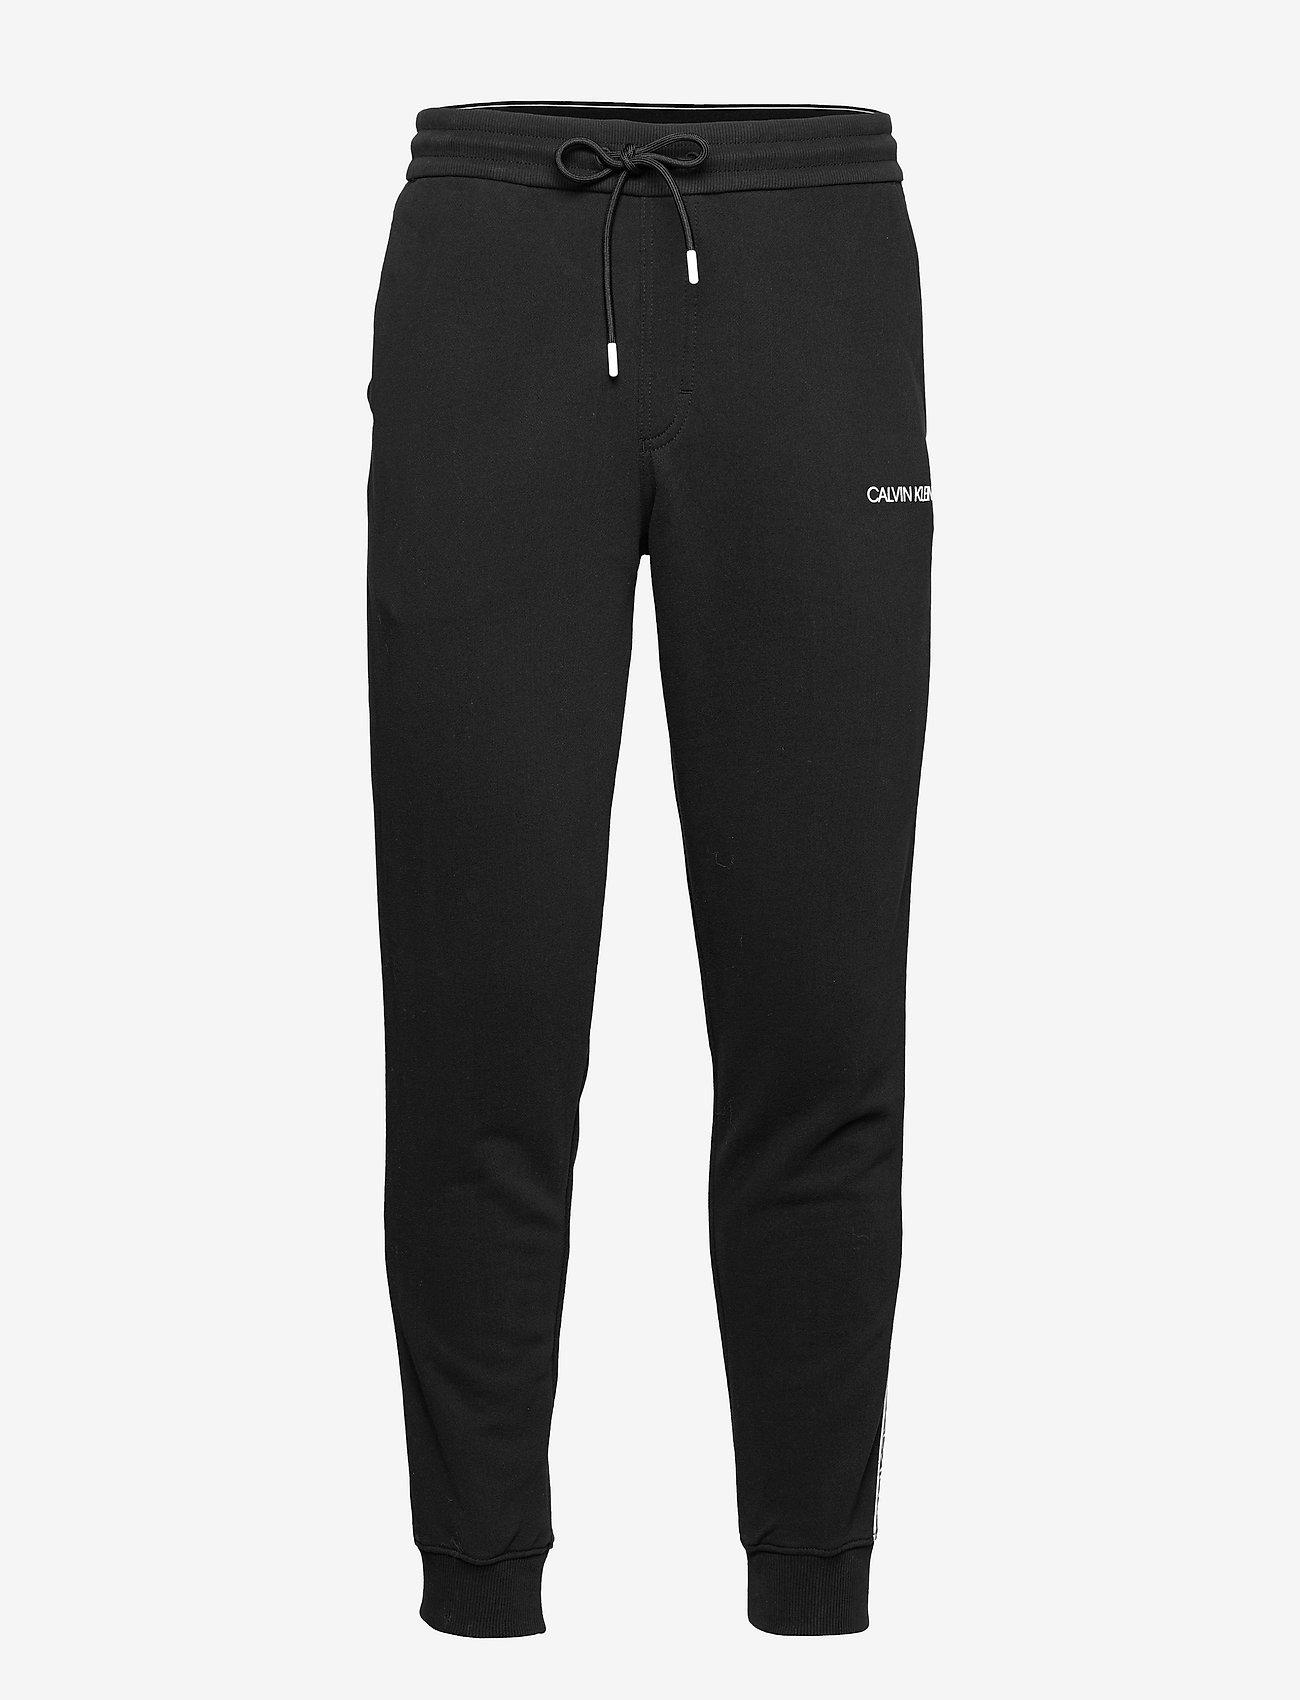 Calvin Klein - ESSENTIAL LOGO TAPE SWEATPANT - kleding - ck black - 0